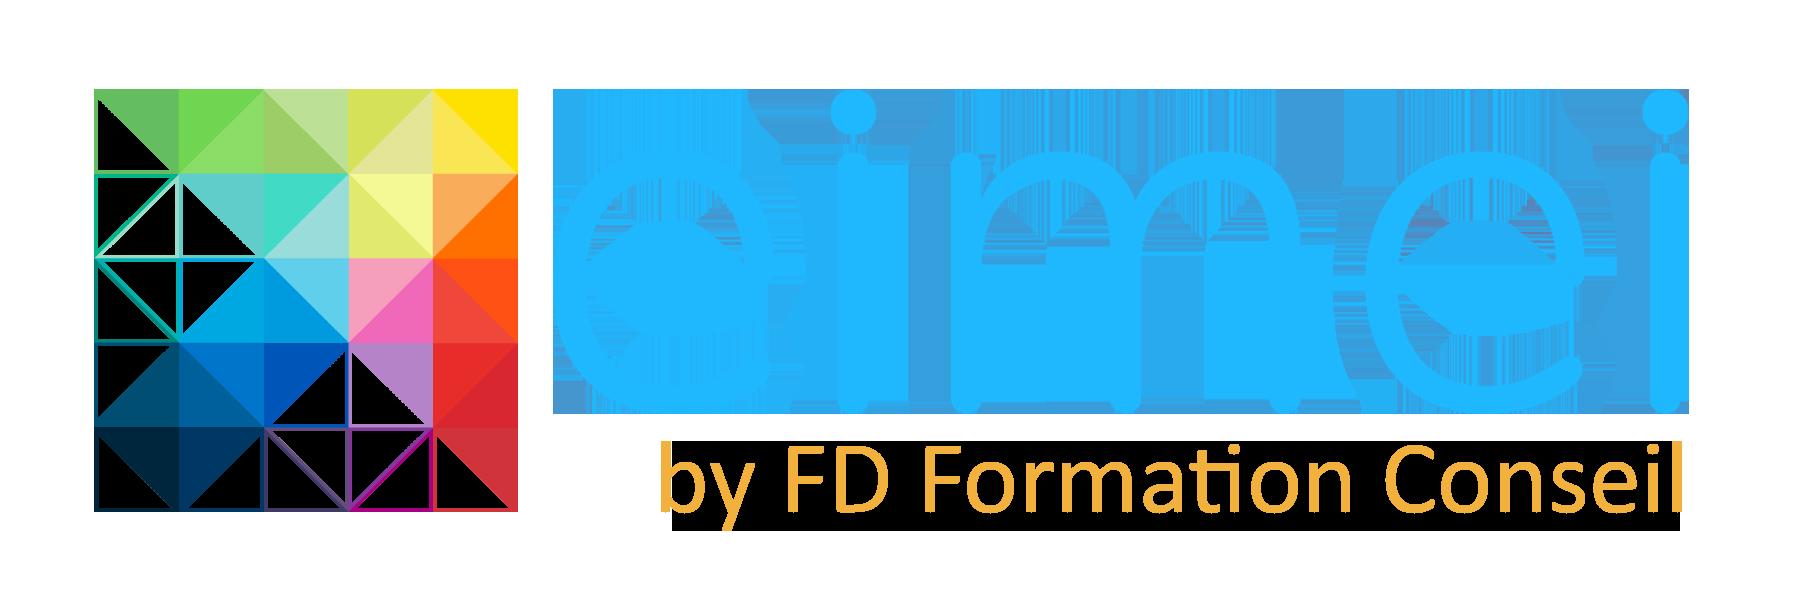 FD Formation Conseil